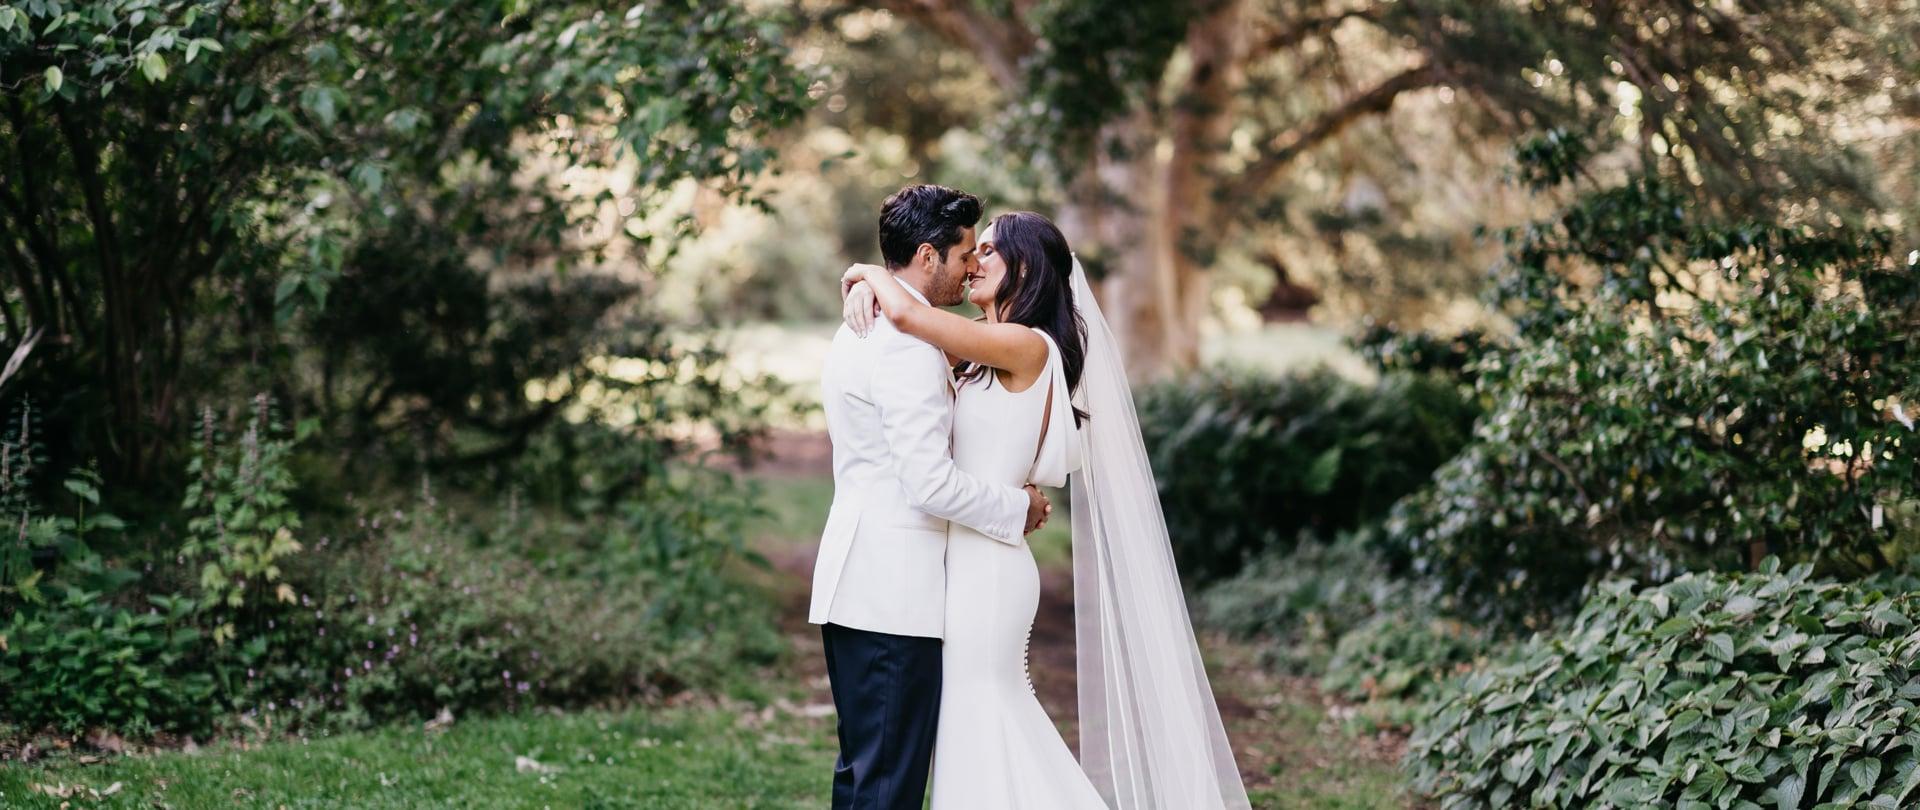 Rebecca & Alex Wedding Video Filmed at Melbourne, Victoria